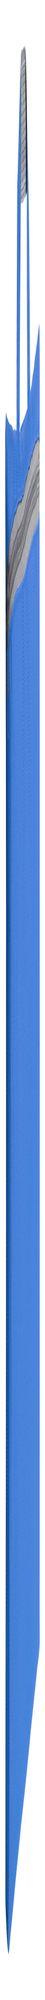 Сумка-папка SIMPLE, ярко-синяя